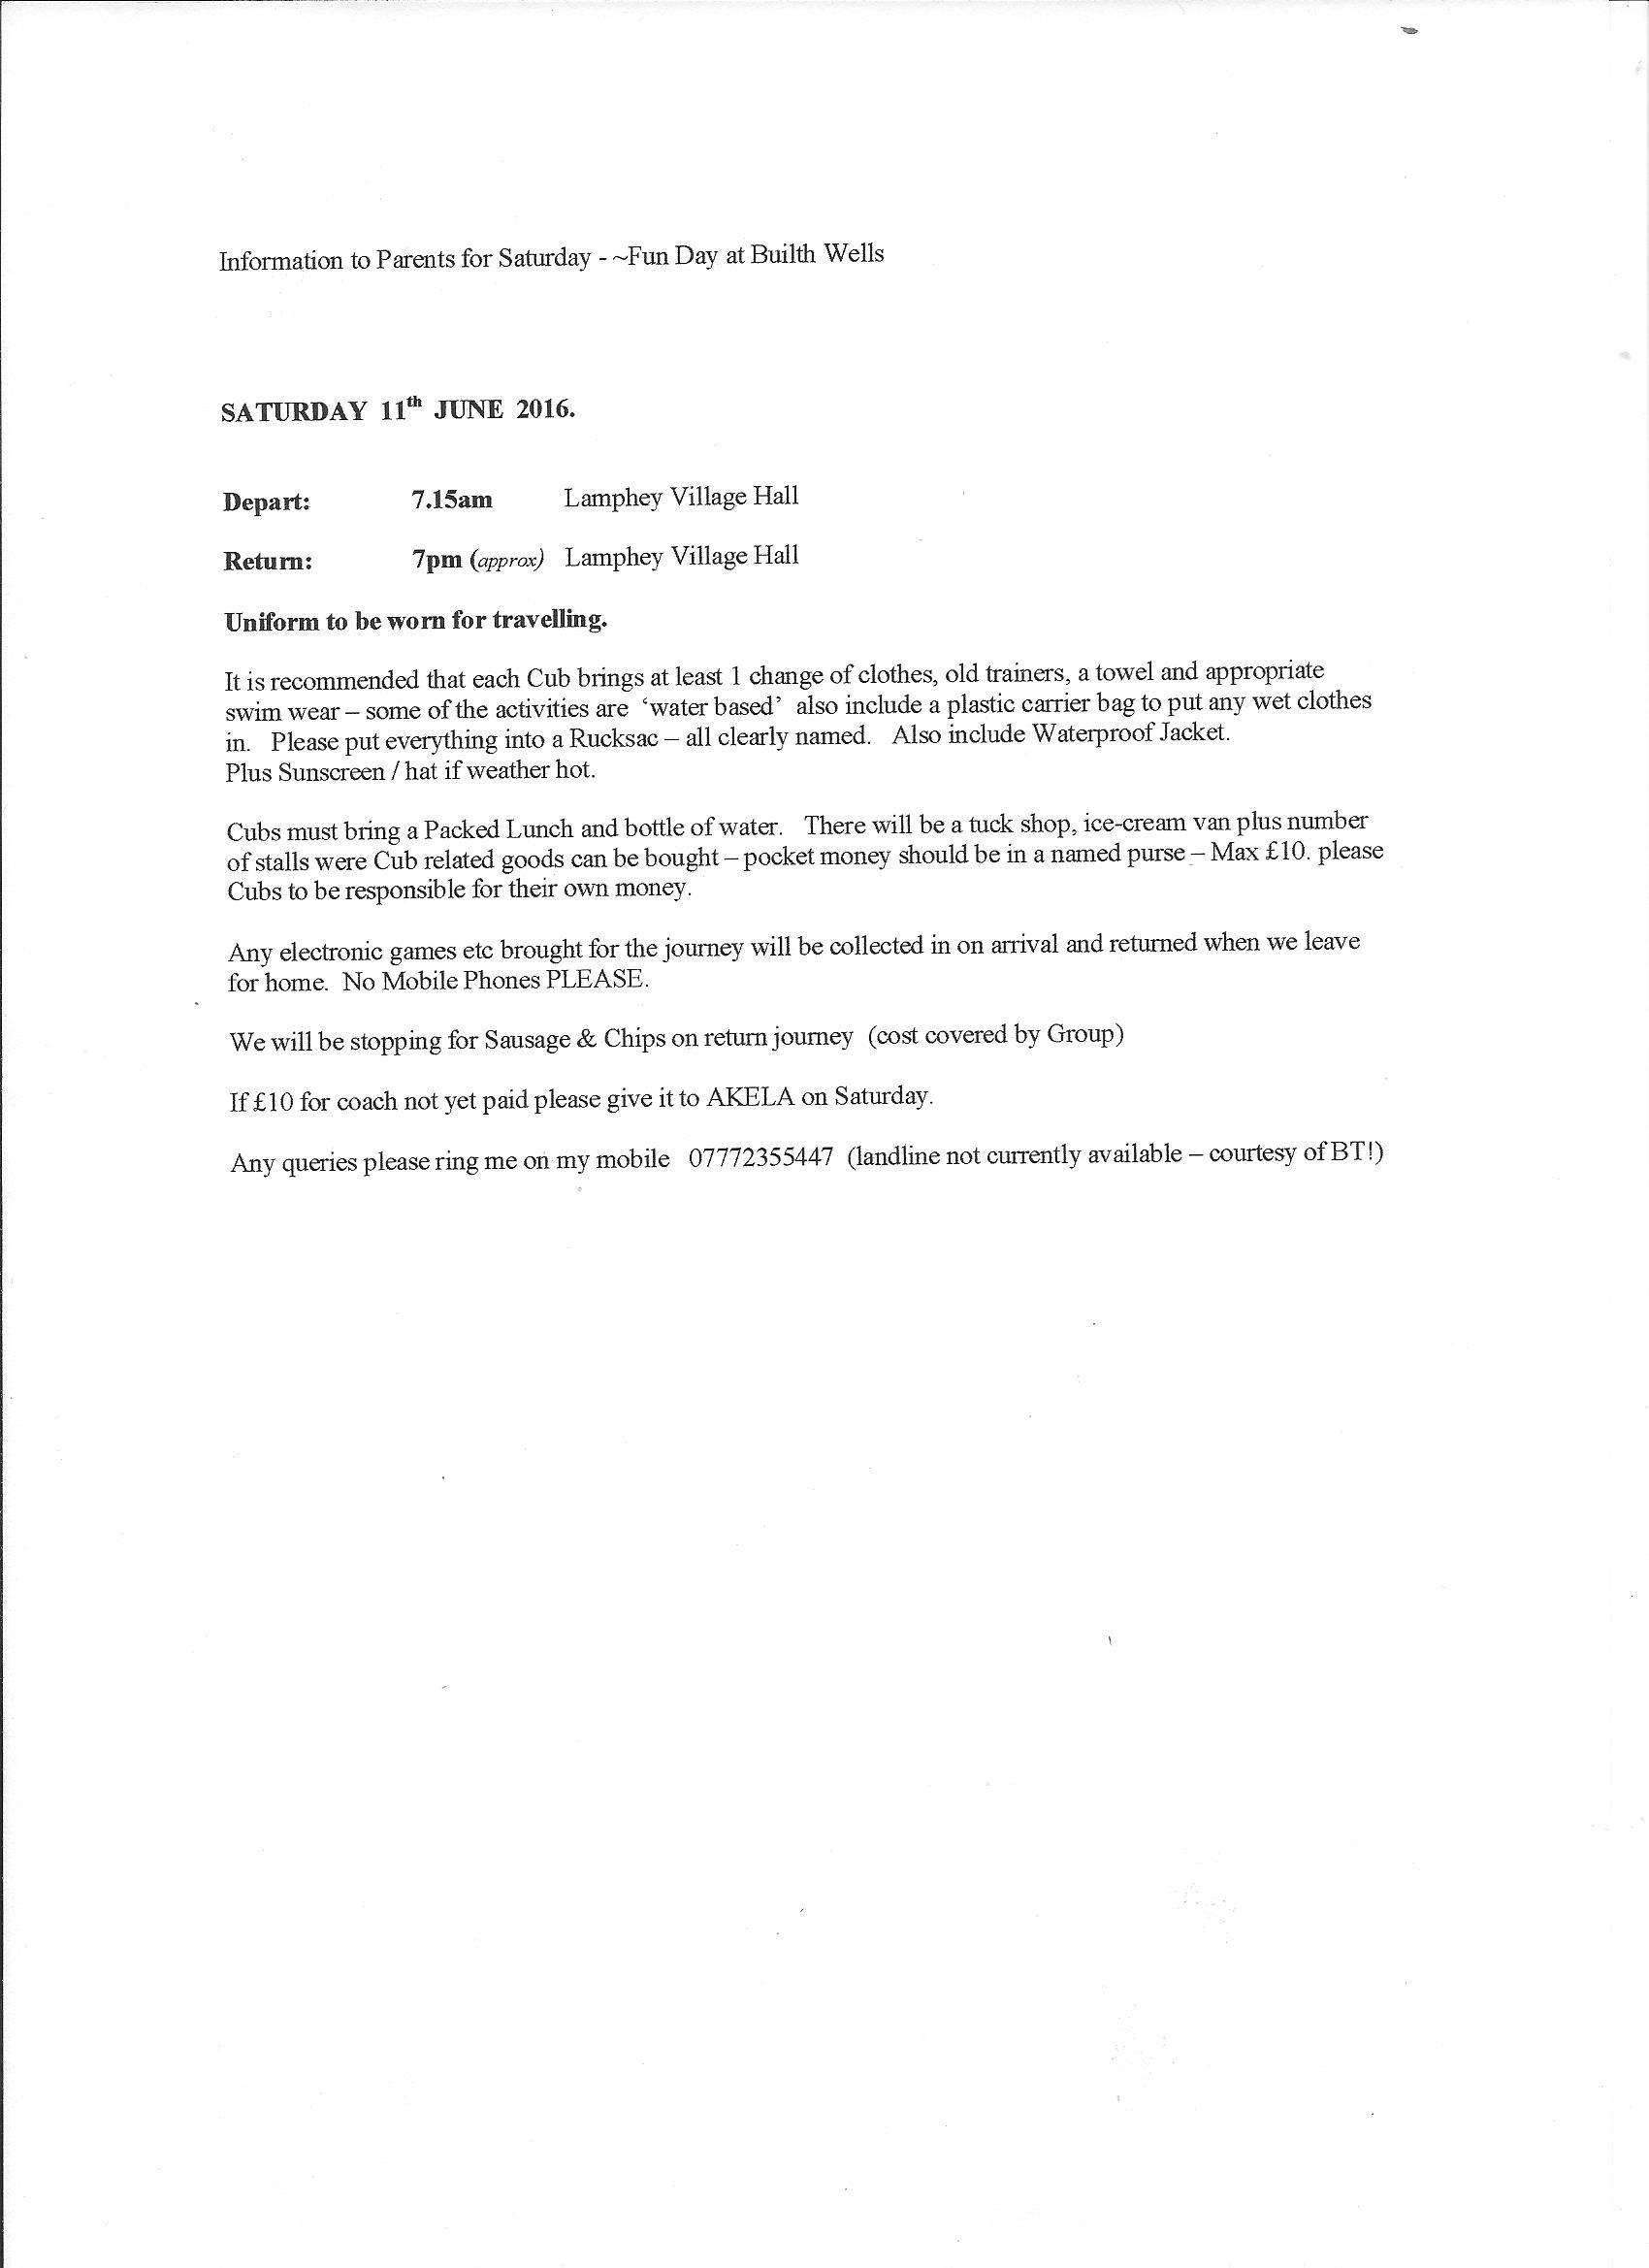 Cub Fun Day Letter